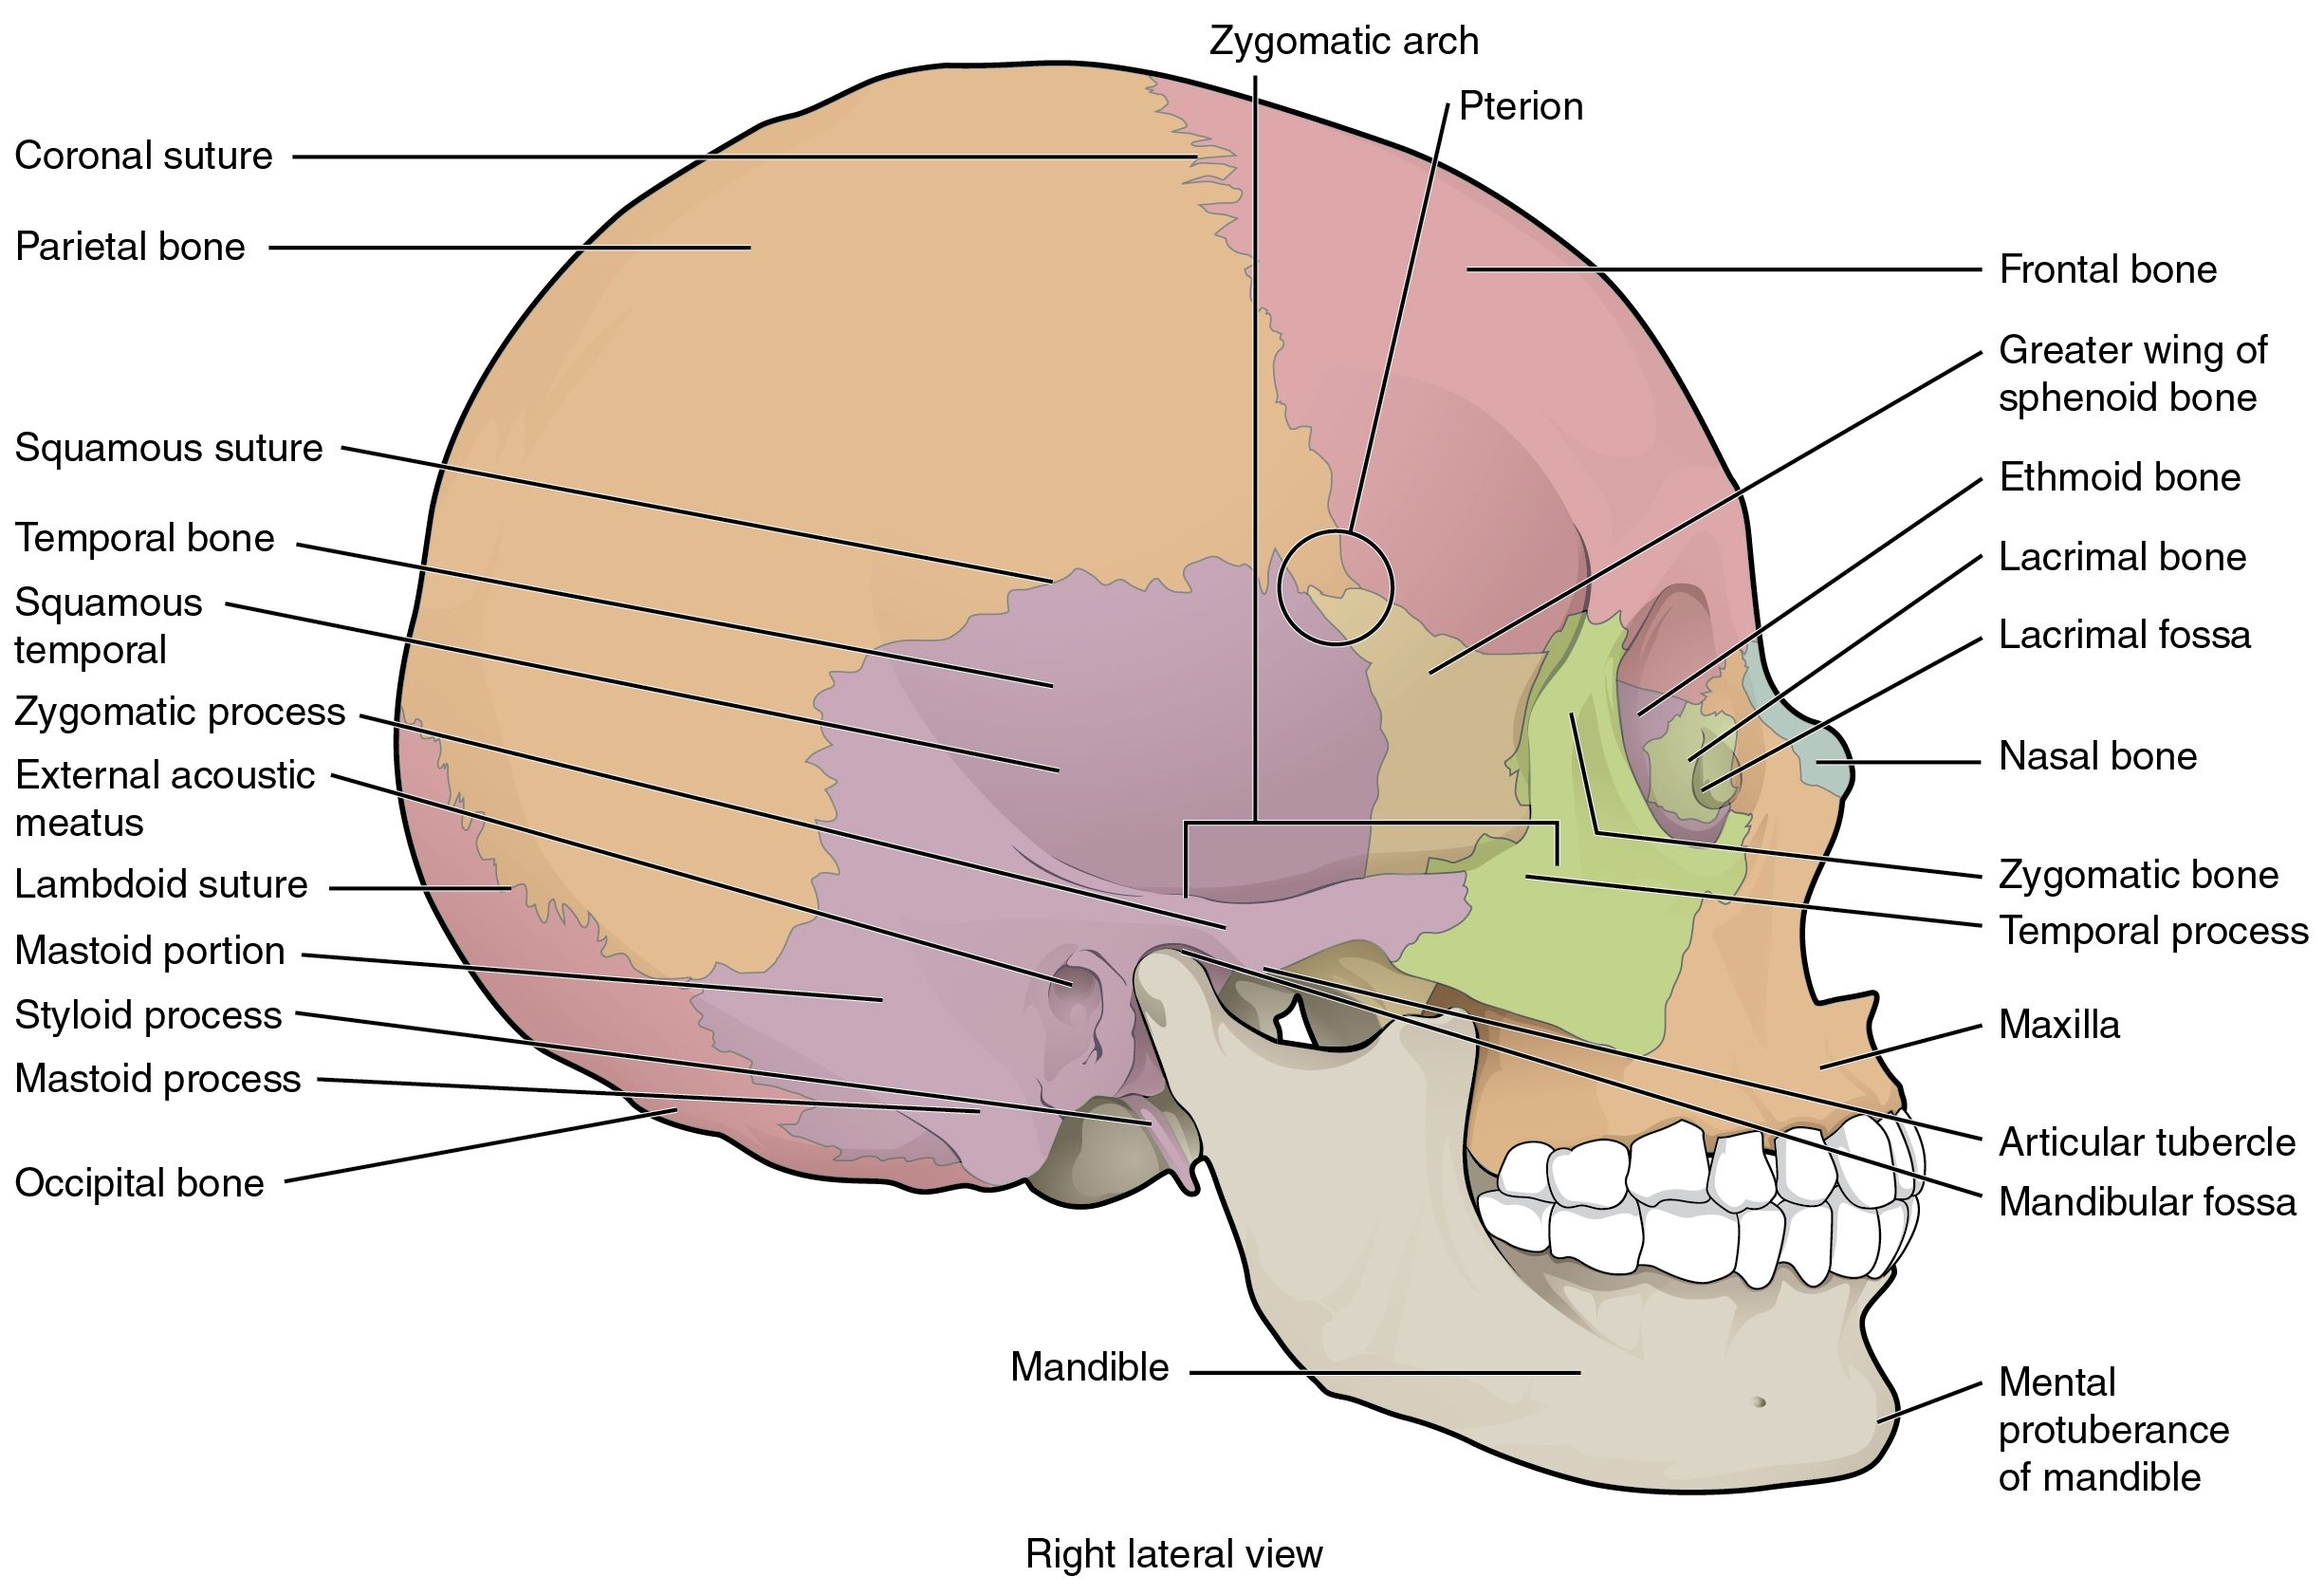 Brain And Skull Anatomy The Skull · Anatomy And Physiology | smoke01 ...